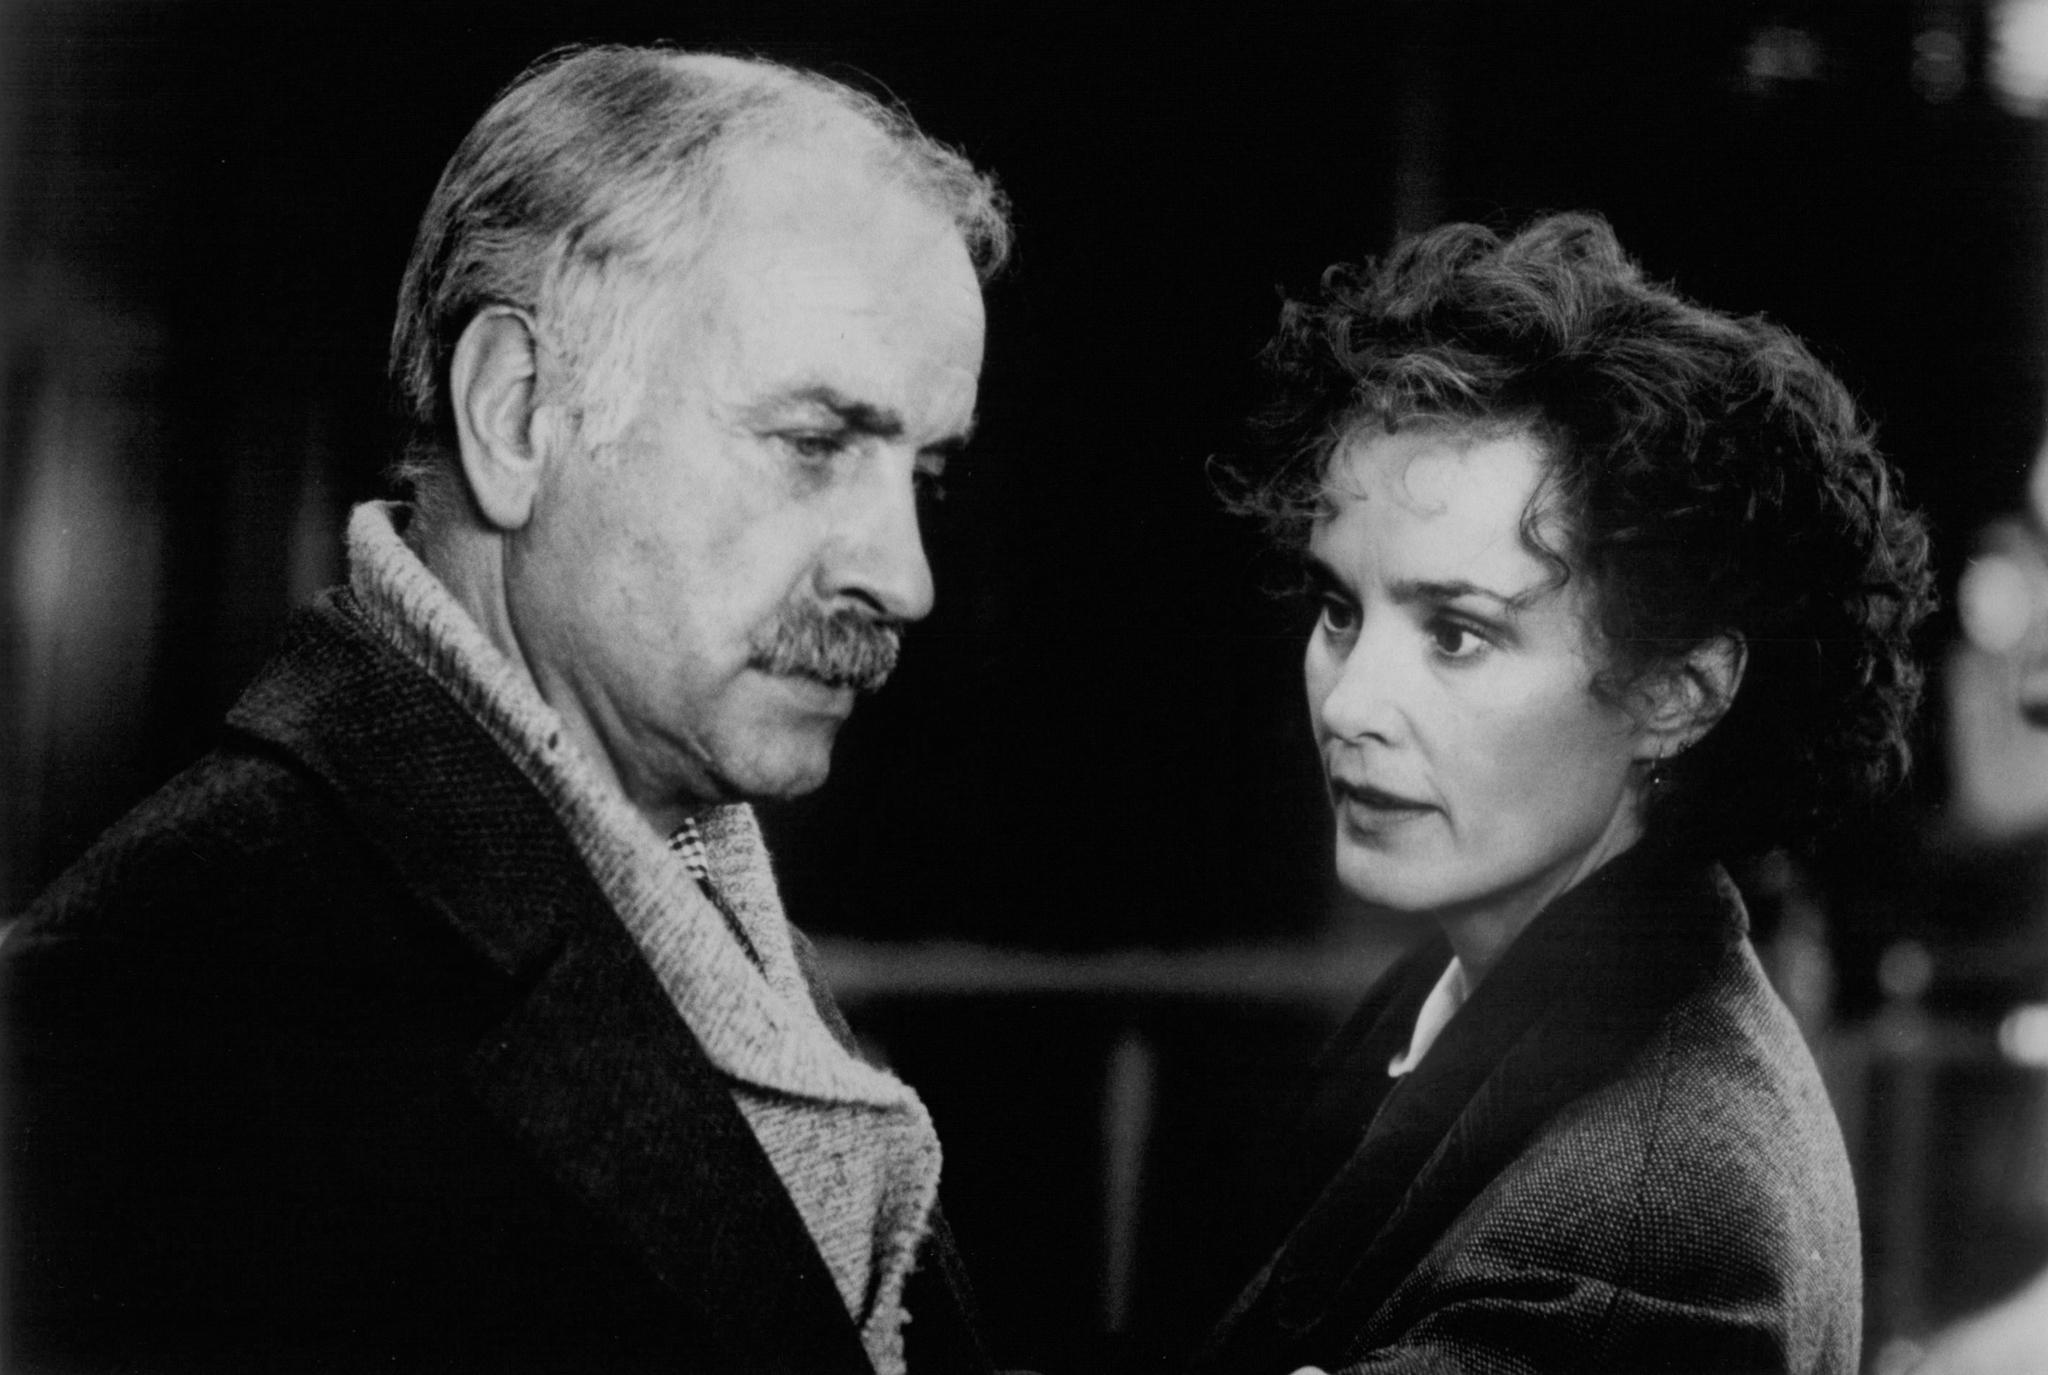 Music Box (1989) – Crime, Drama, Thriller